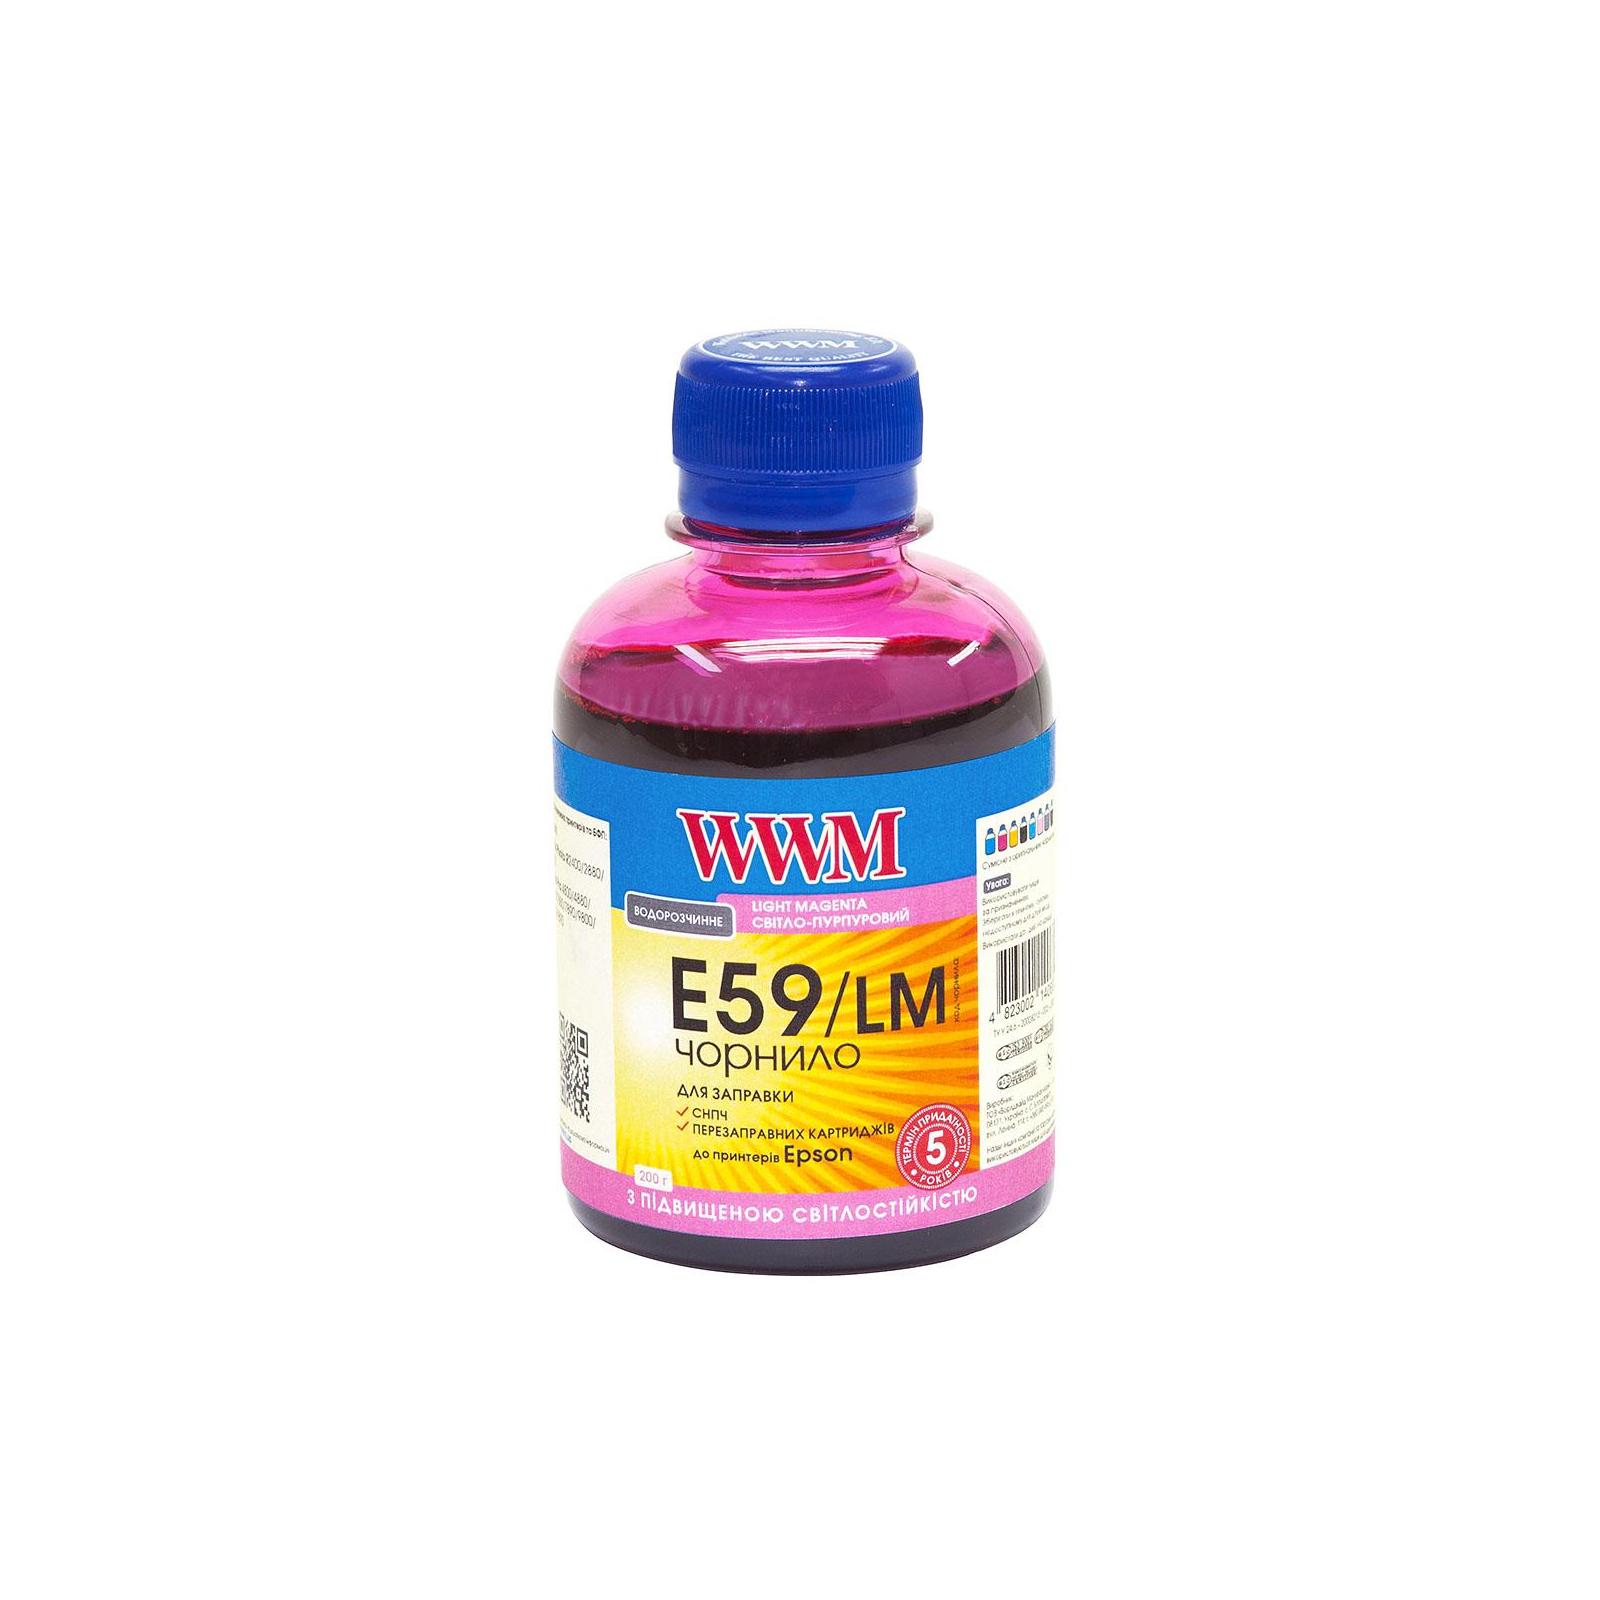 Чернила WWM EPSON StPro 7890/9890 Light Magenta (E59/LM)